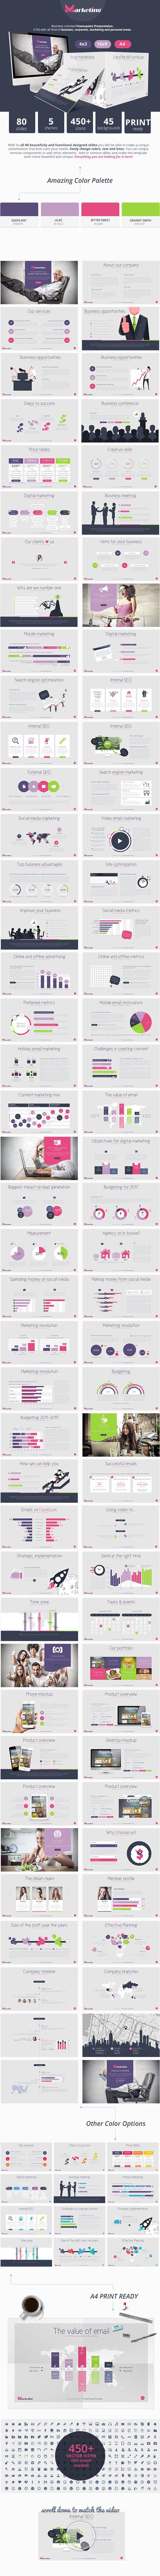 Mega Marketing Powerpoint Presentation (PowerPoint Templates)